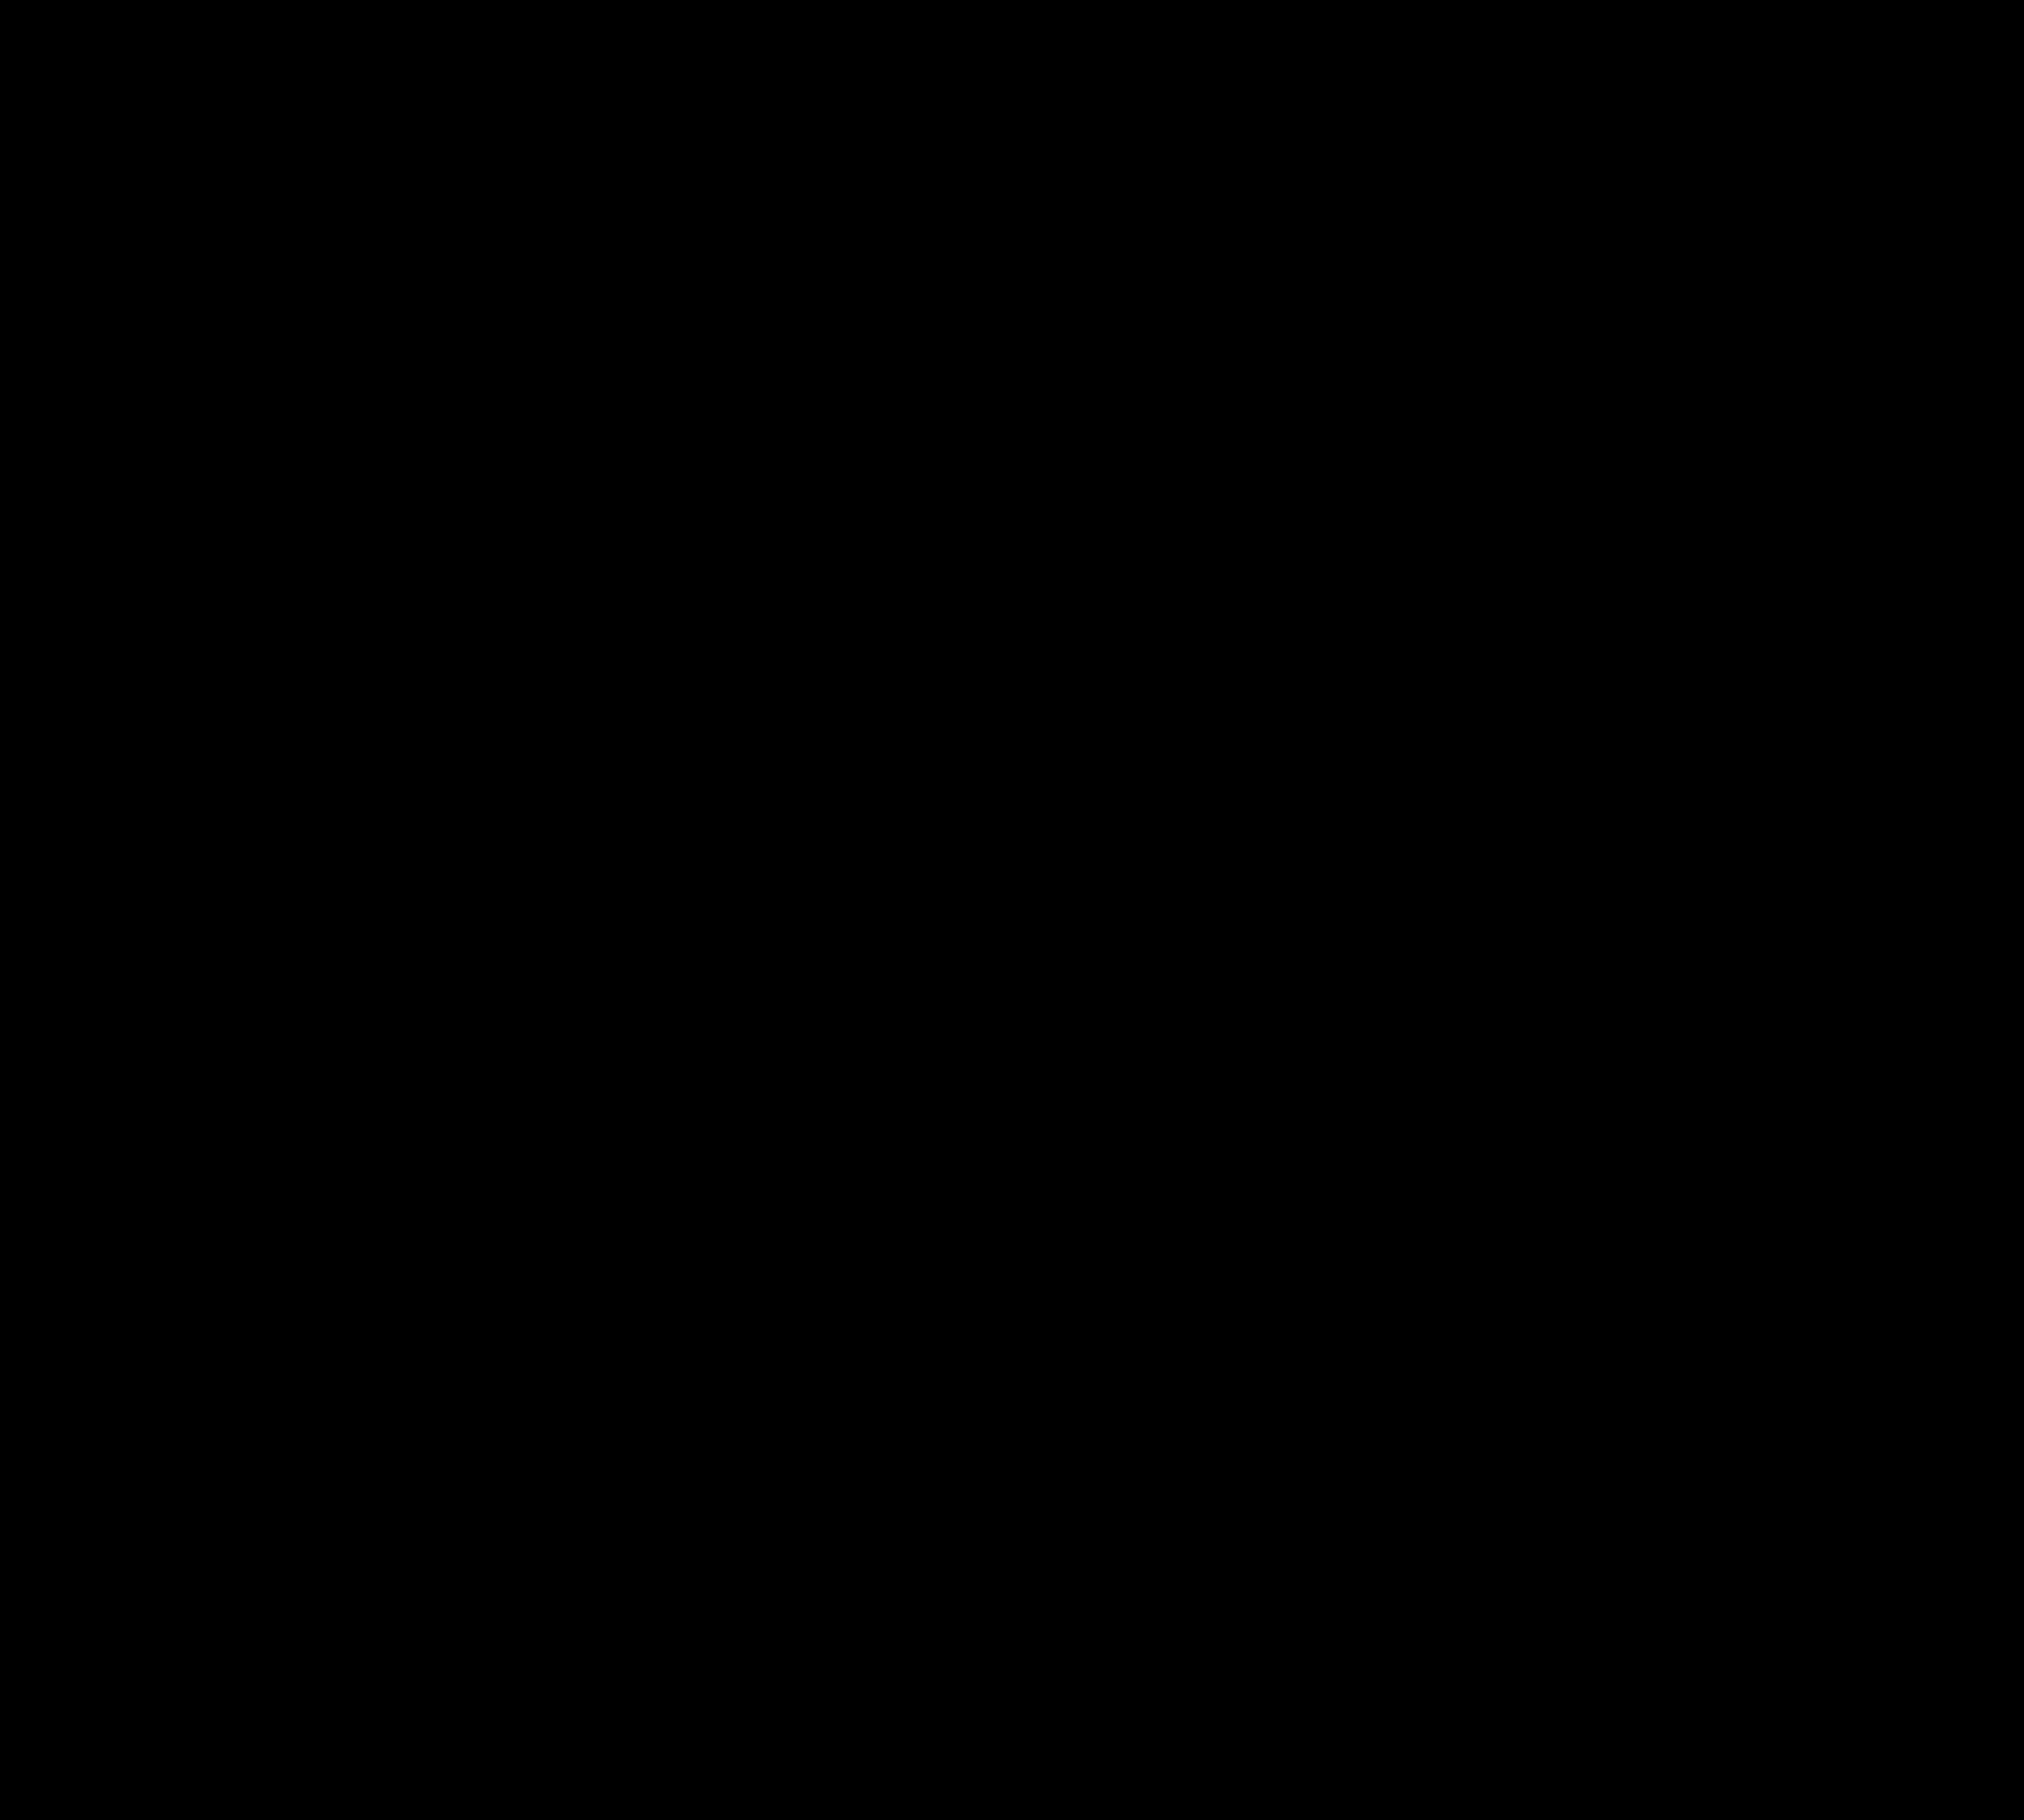 xp investimentos logo 8 - XP Investimentos Logo